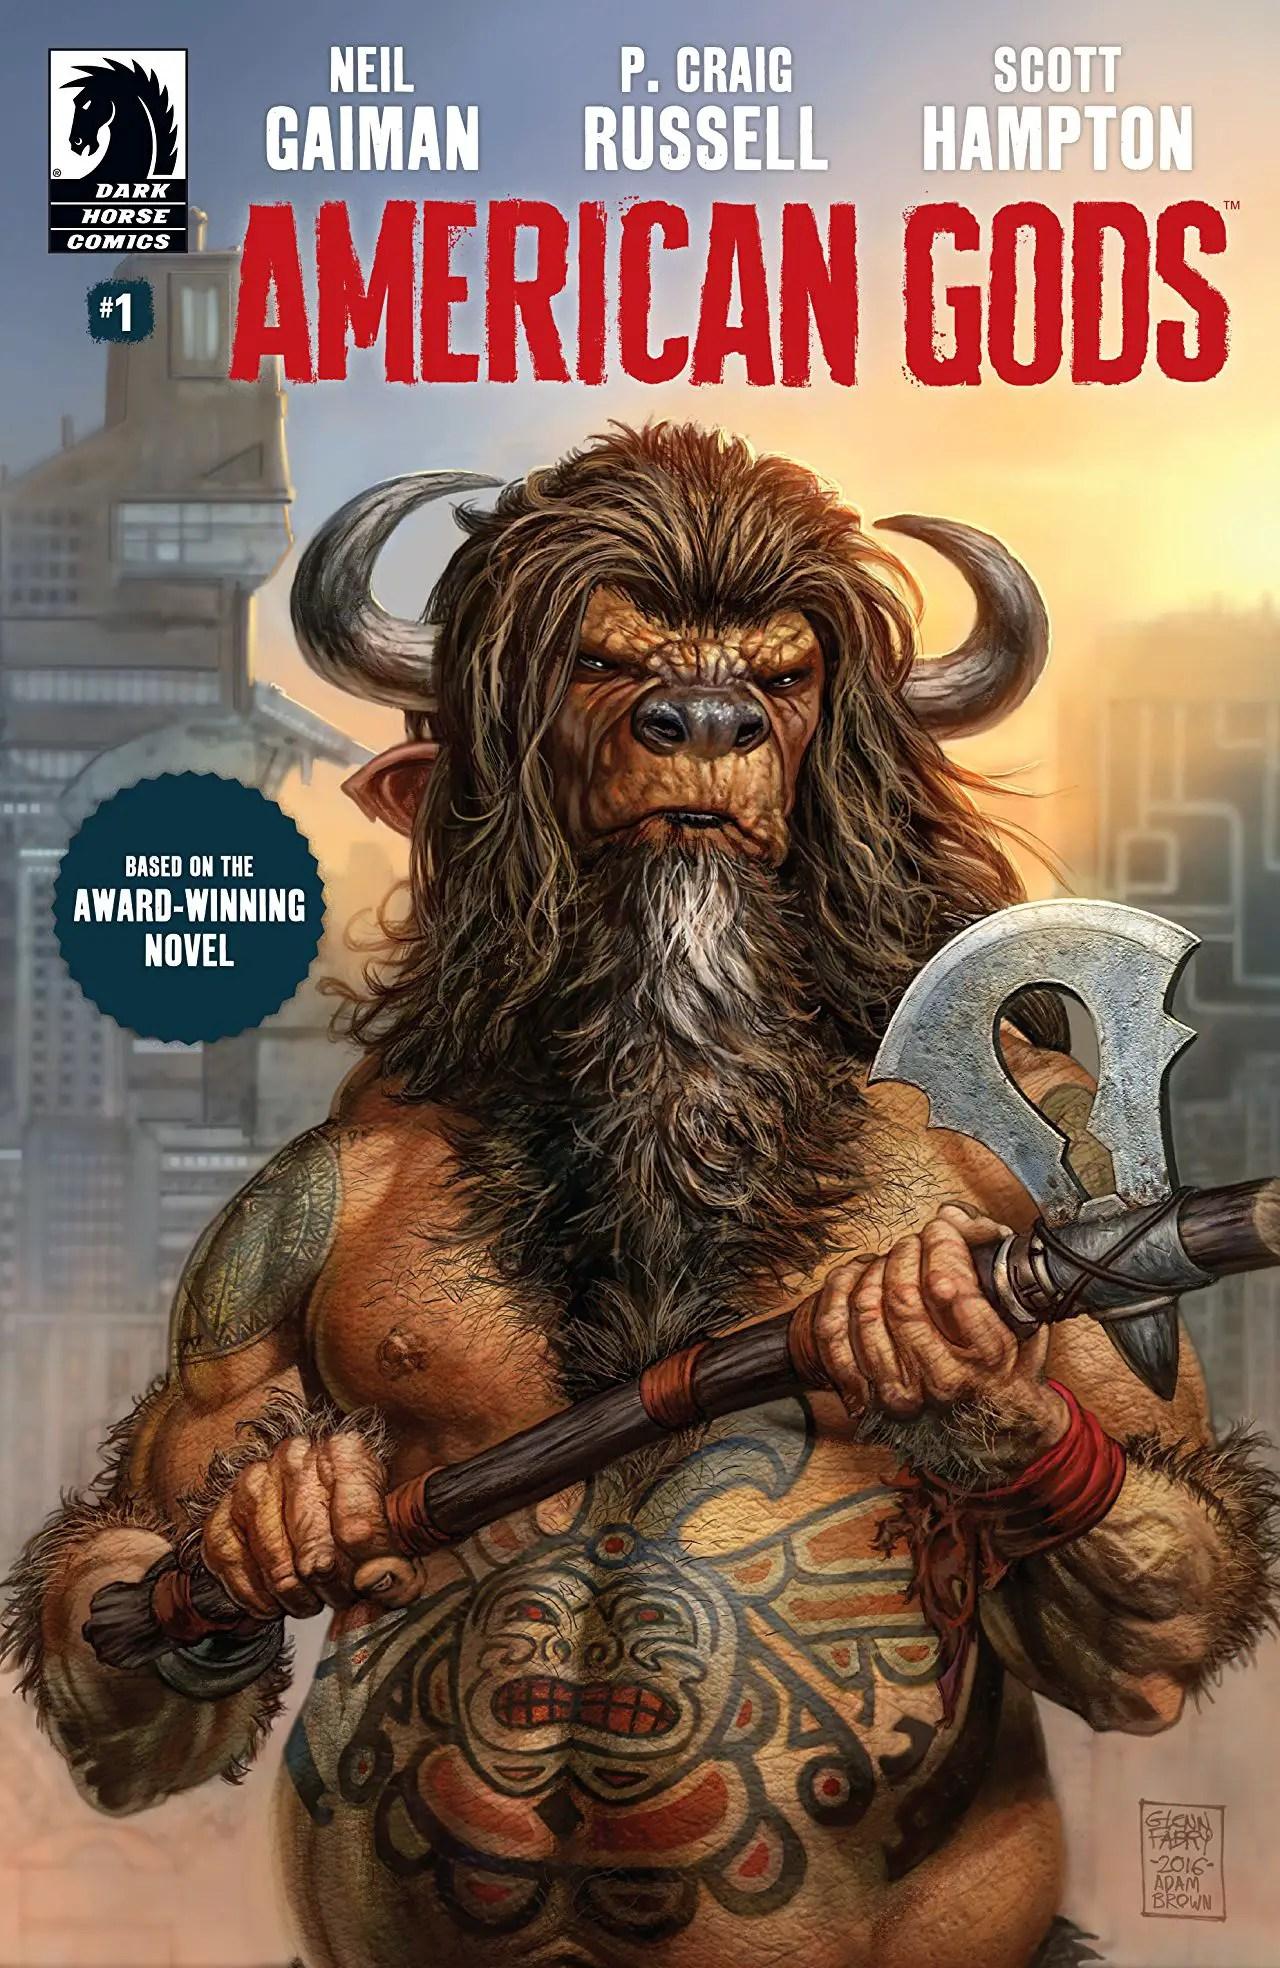 'American Gods Vol. 1: Shadows' brings Neil Gaiman's world to life in a beautiful way